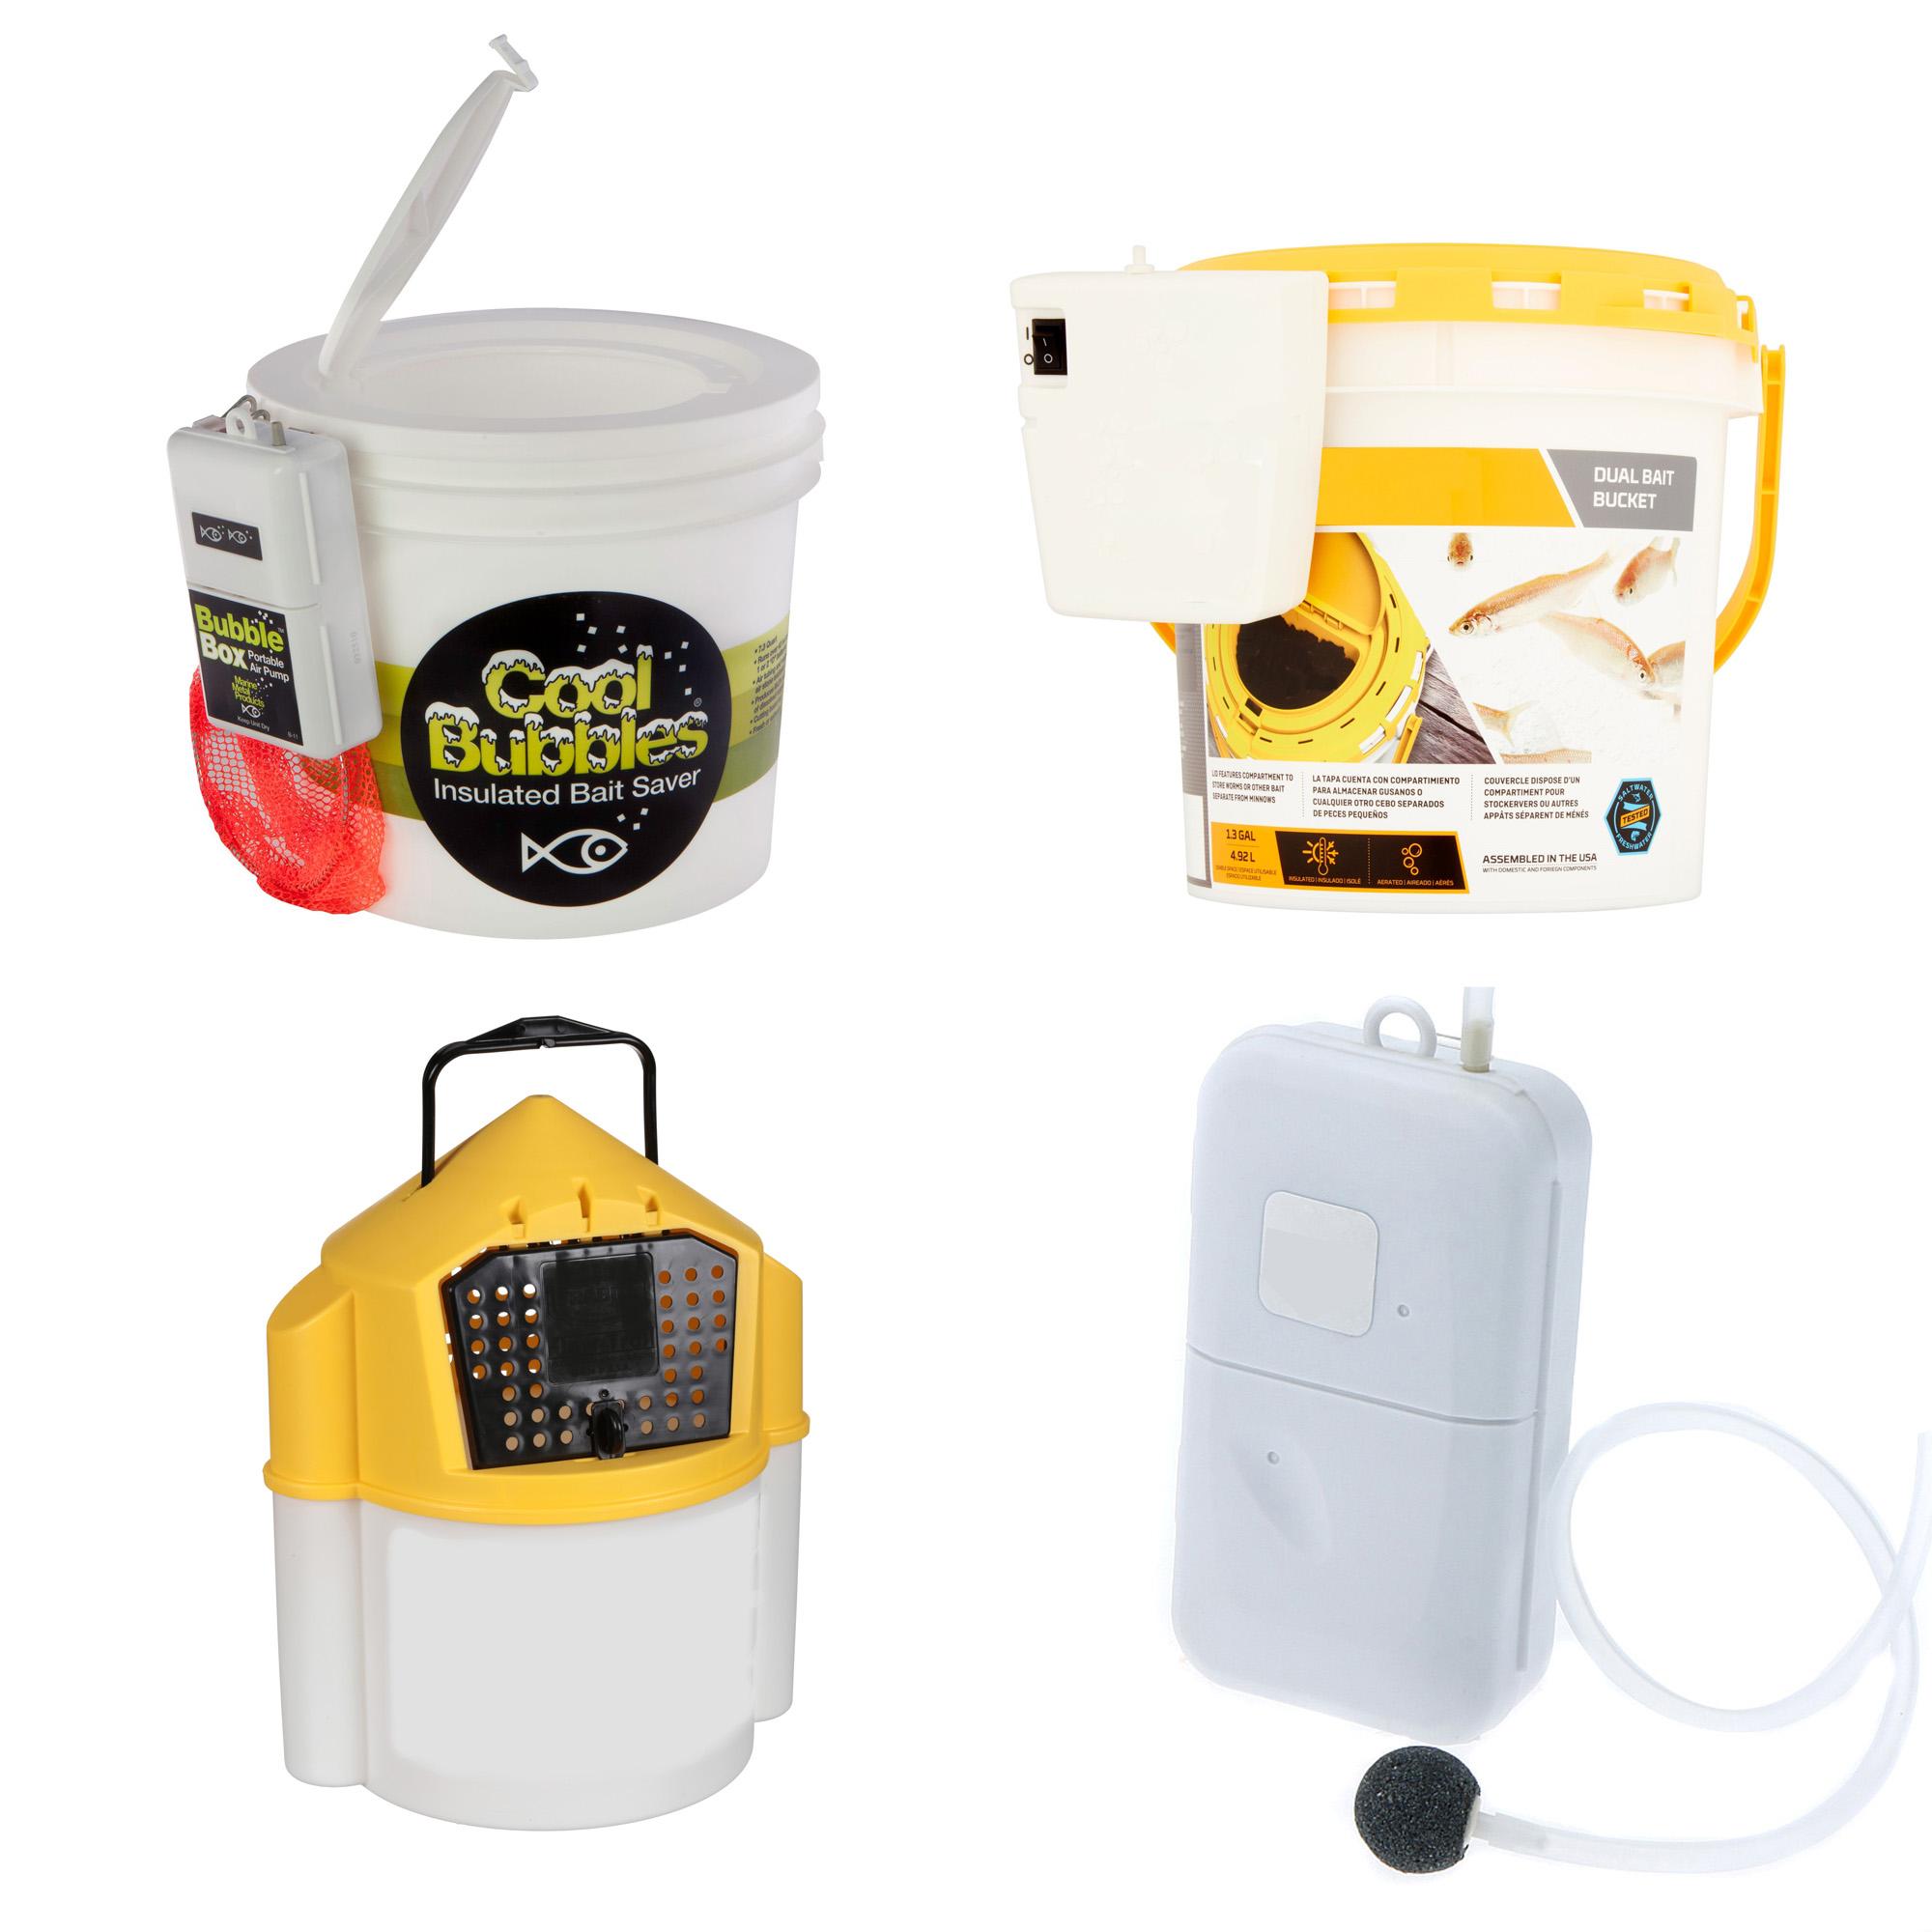 Aerators and bait buckets